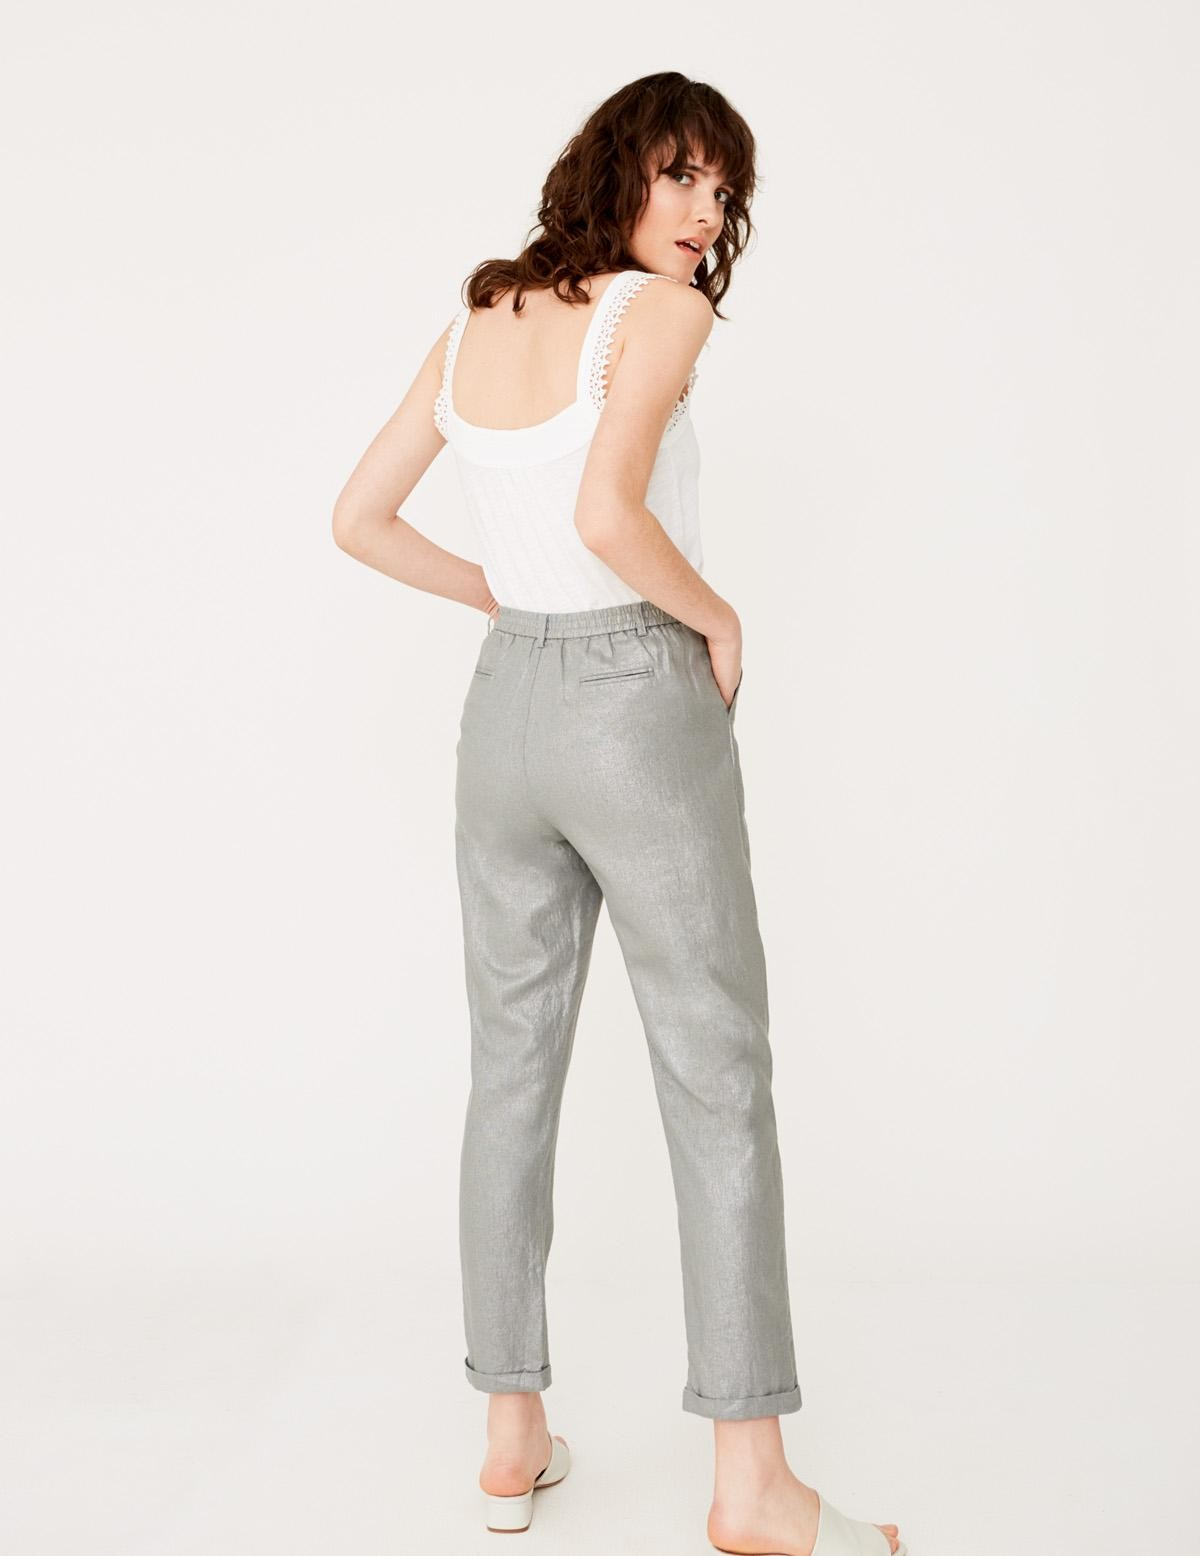 Pantalón lino metalizado - Ítem1